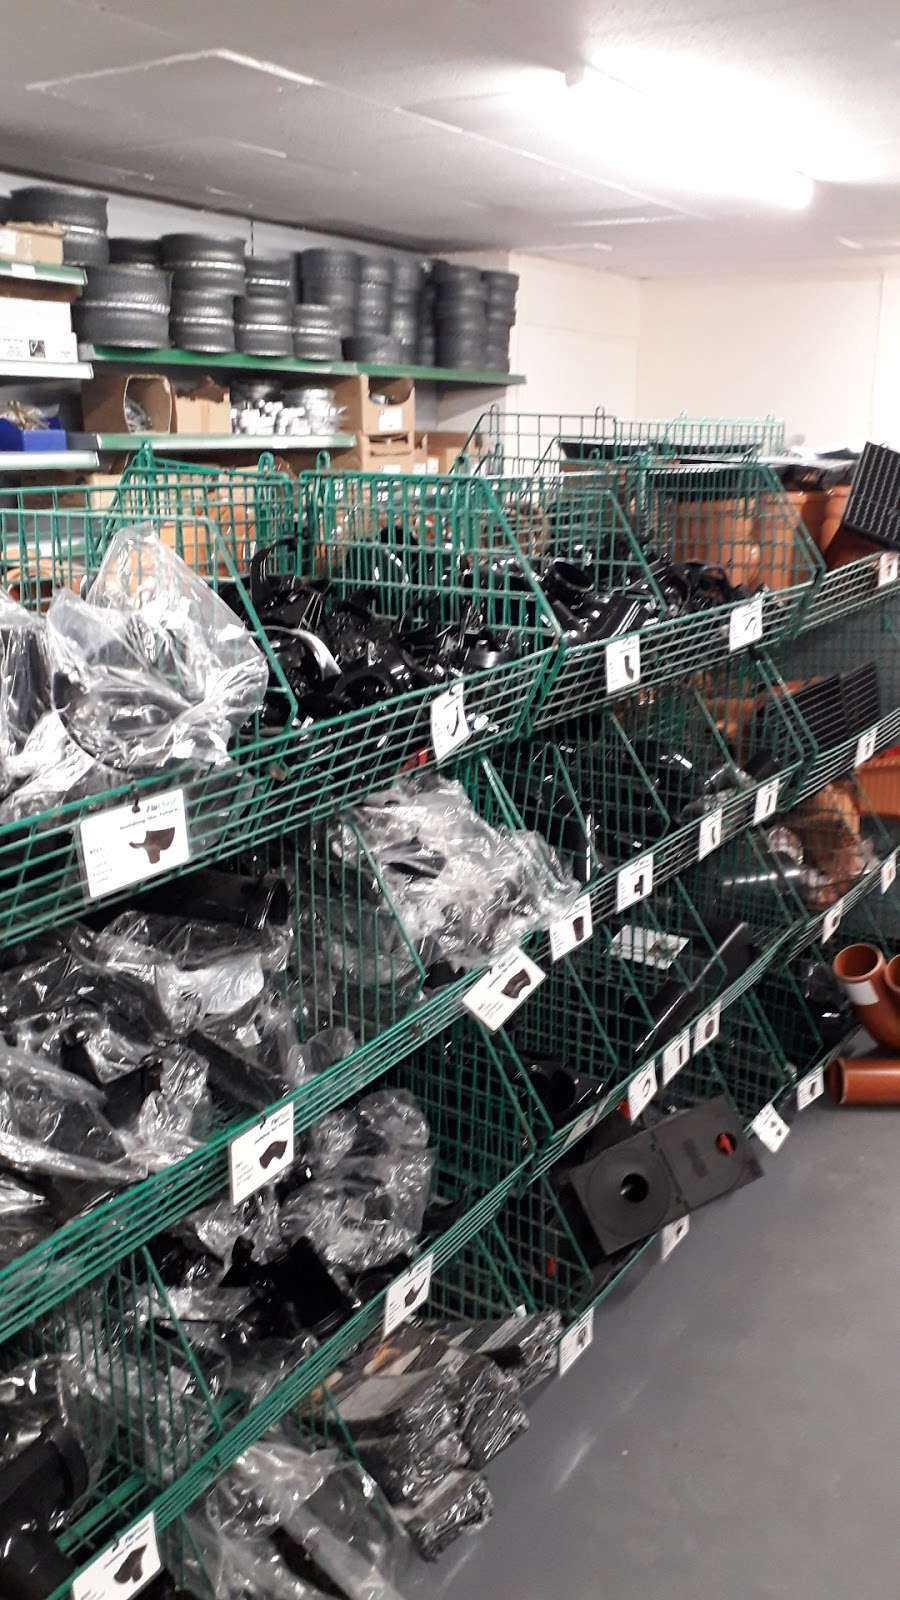 OTBS - home goods store  | Photo 6 of 10 | Address: Upland House, Upland Rd, Bexleyheath DA7 4NR, UK | Phone: 020 8304 8777